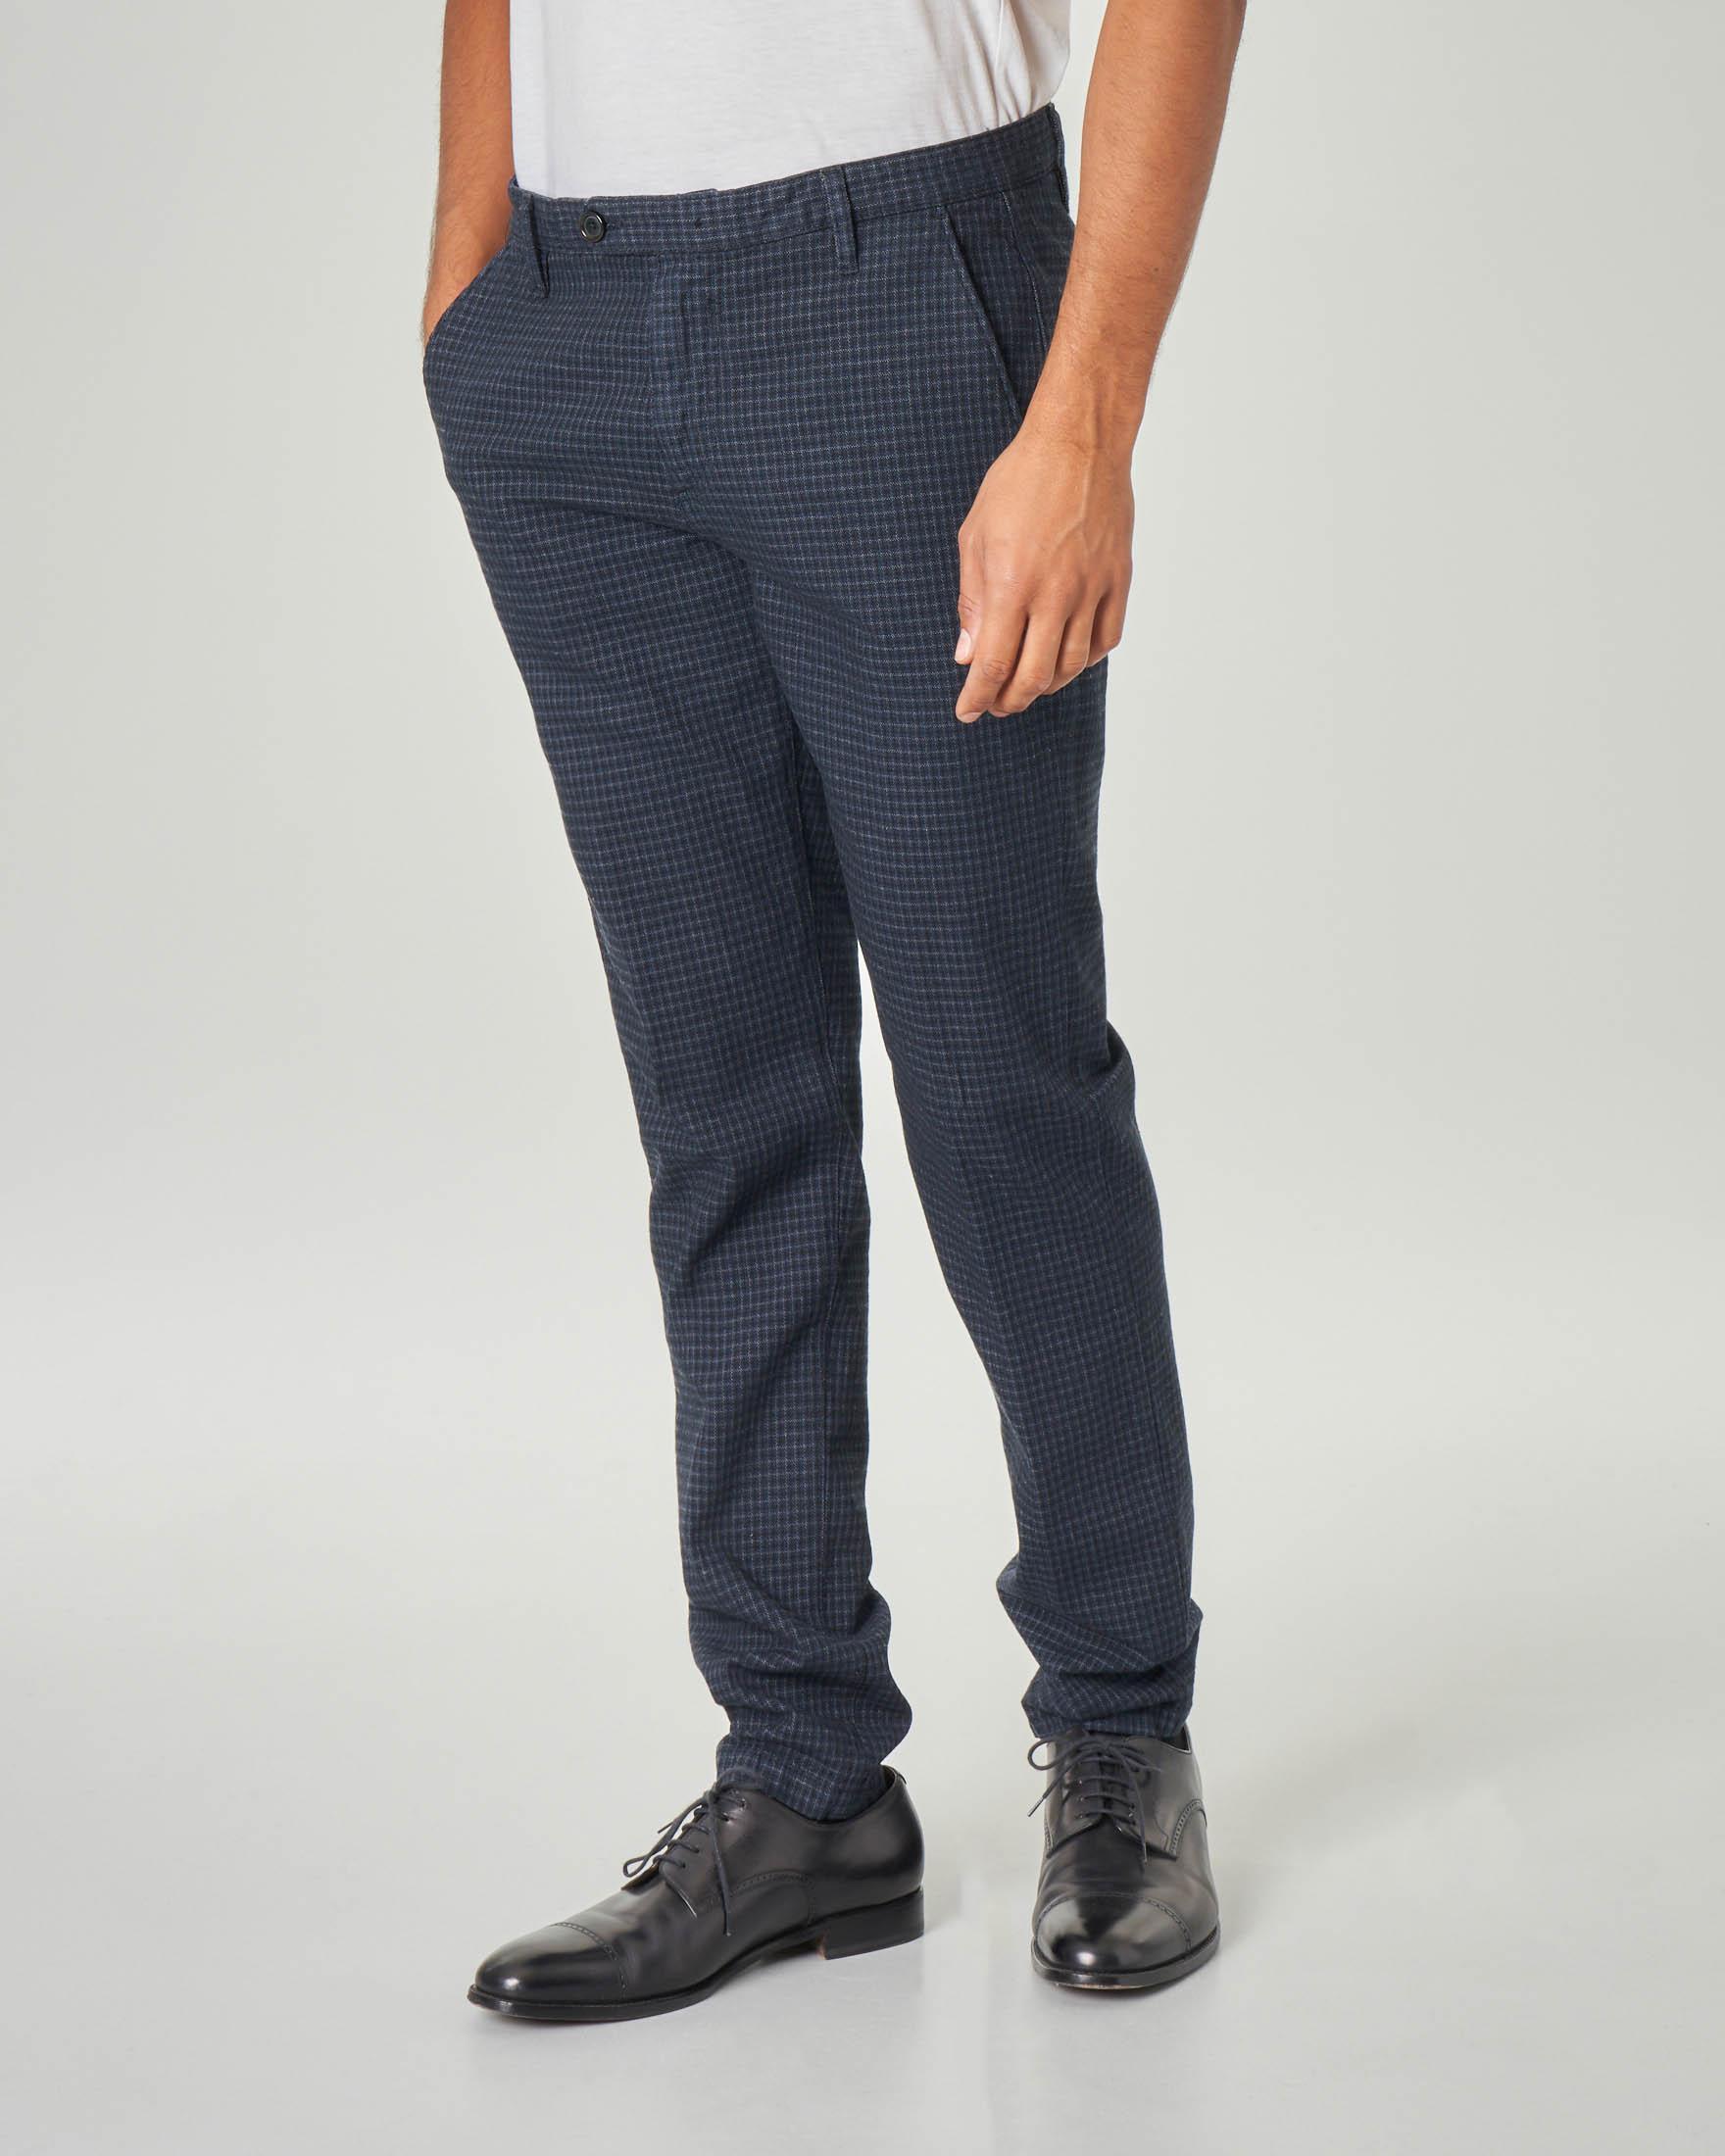 Pantalone chino blu a quadretti in cotone stretch